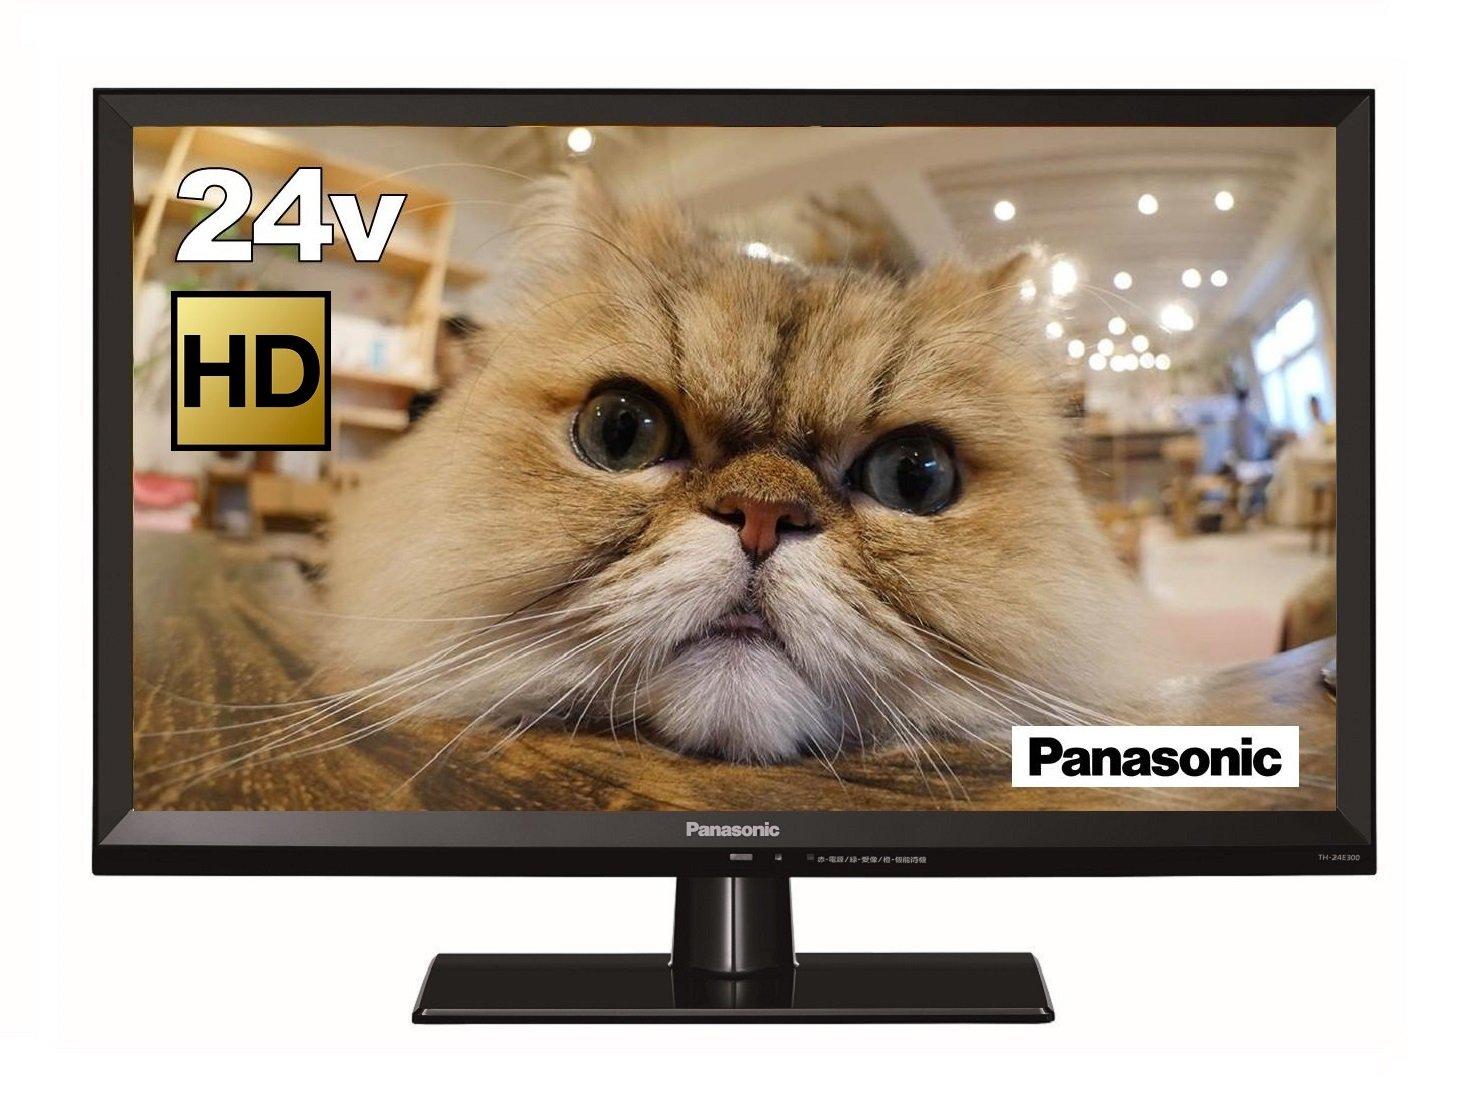 Panasonic 液晶テレビ VIERA TH-24E300 ハイビジョン